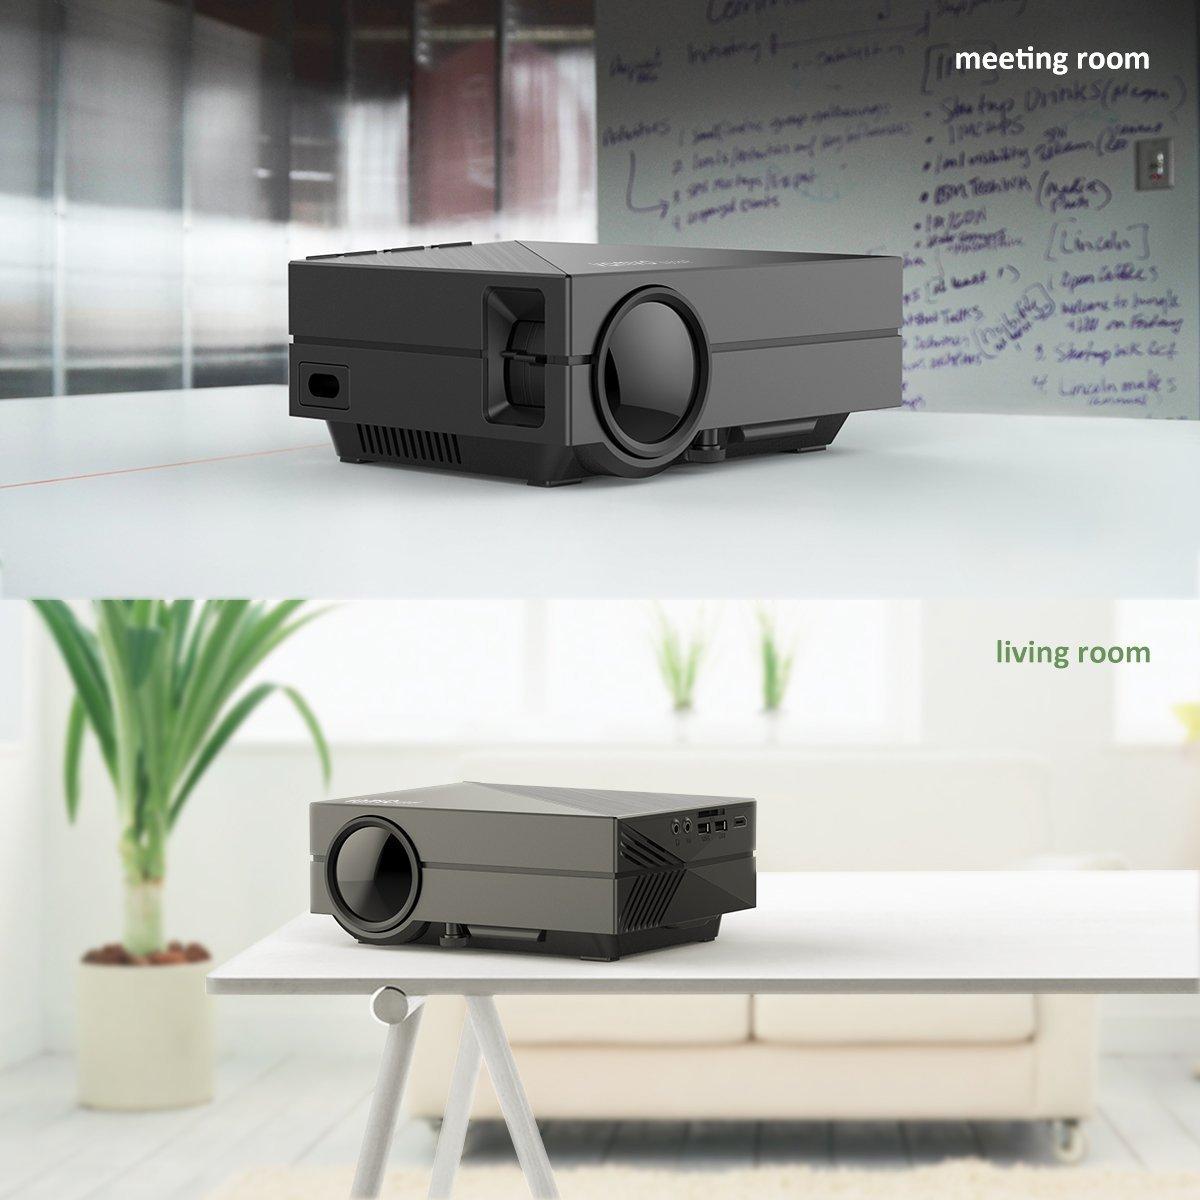 Amazon.com: Vamvo WiFi Wireless Projector (black) Like New: Office ...